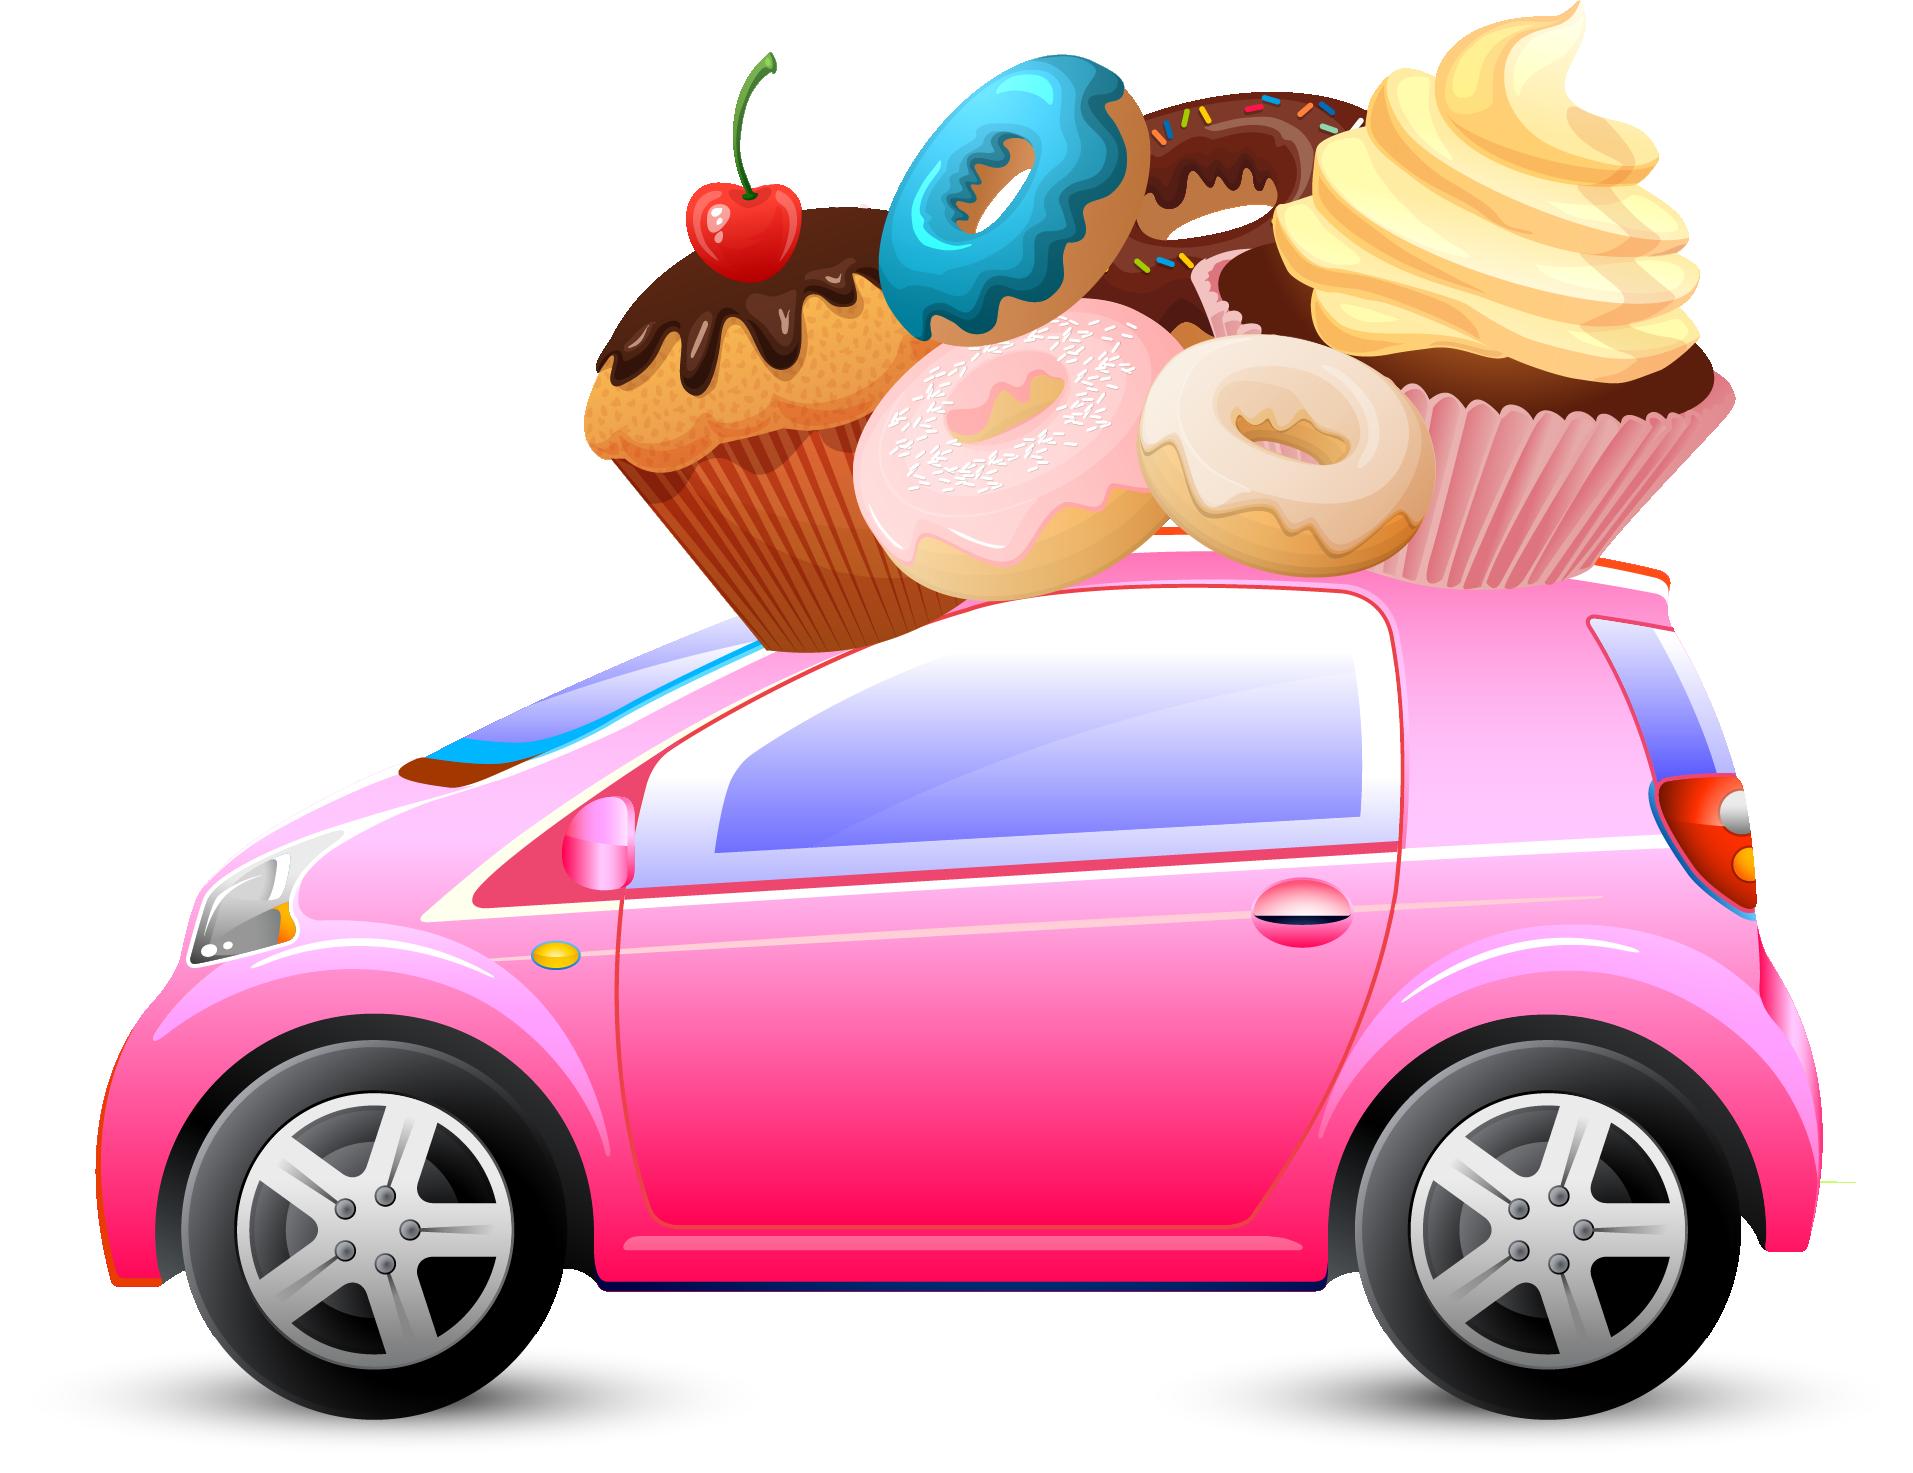 Driving clipart pink car. Electric vehicle tesla motors